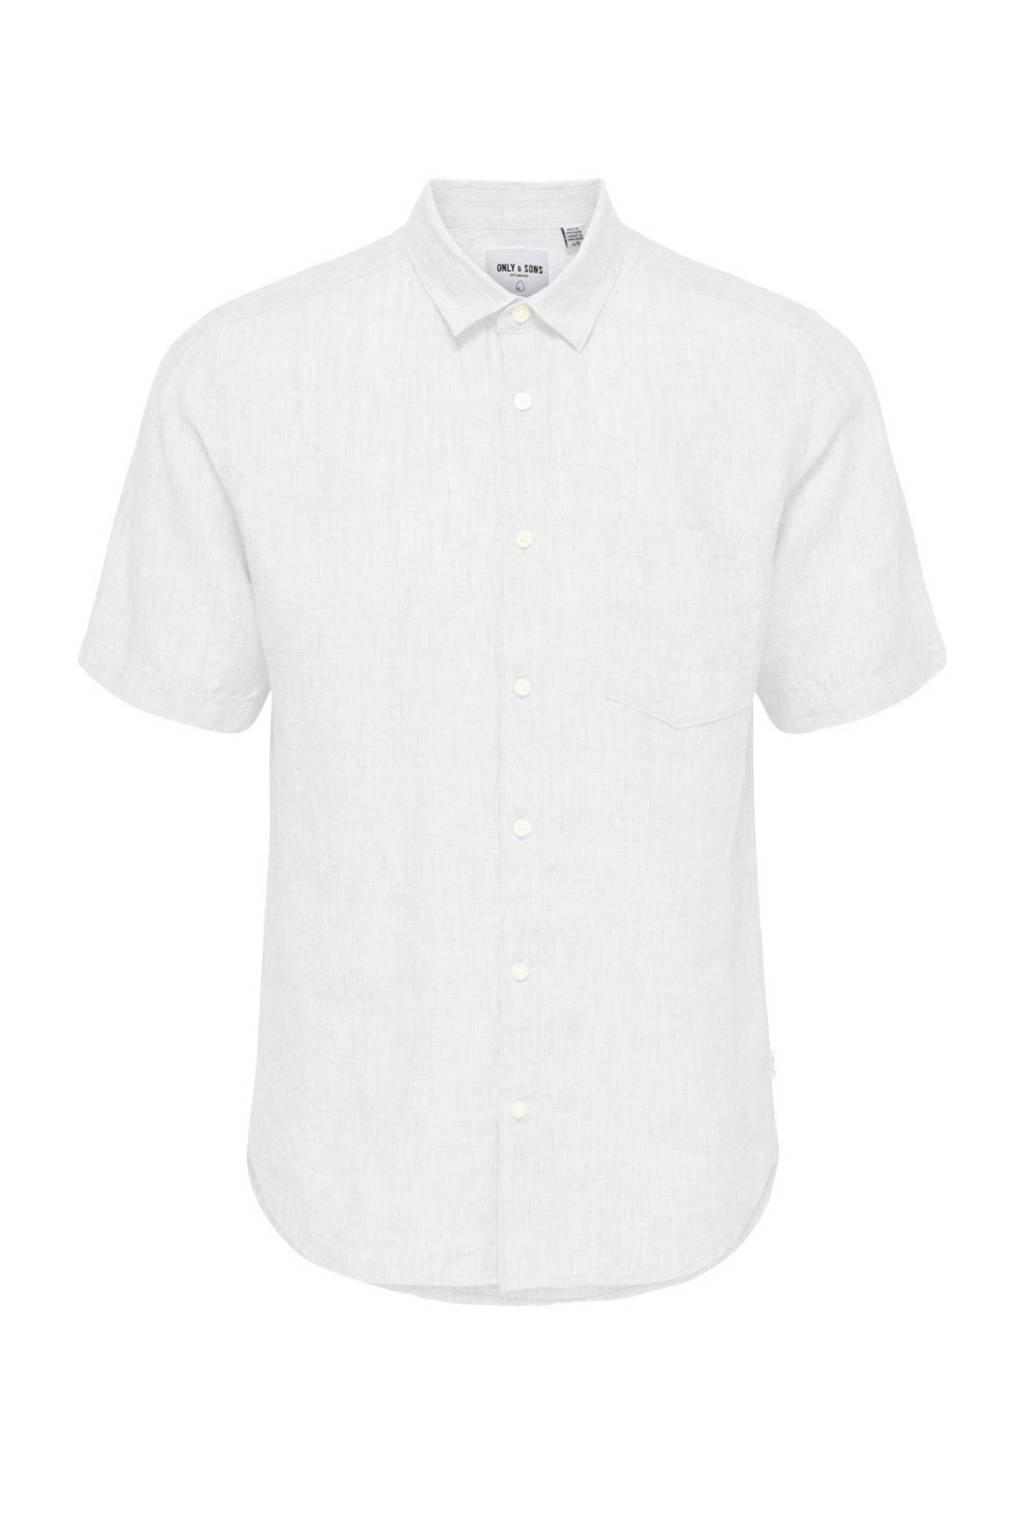 Only & Sons linnen overhemd, Wit